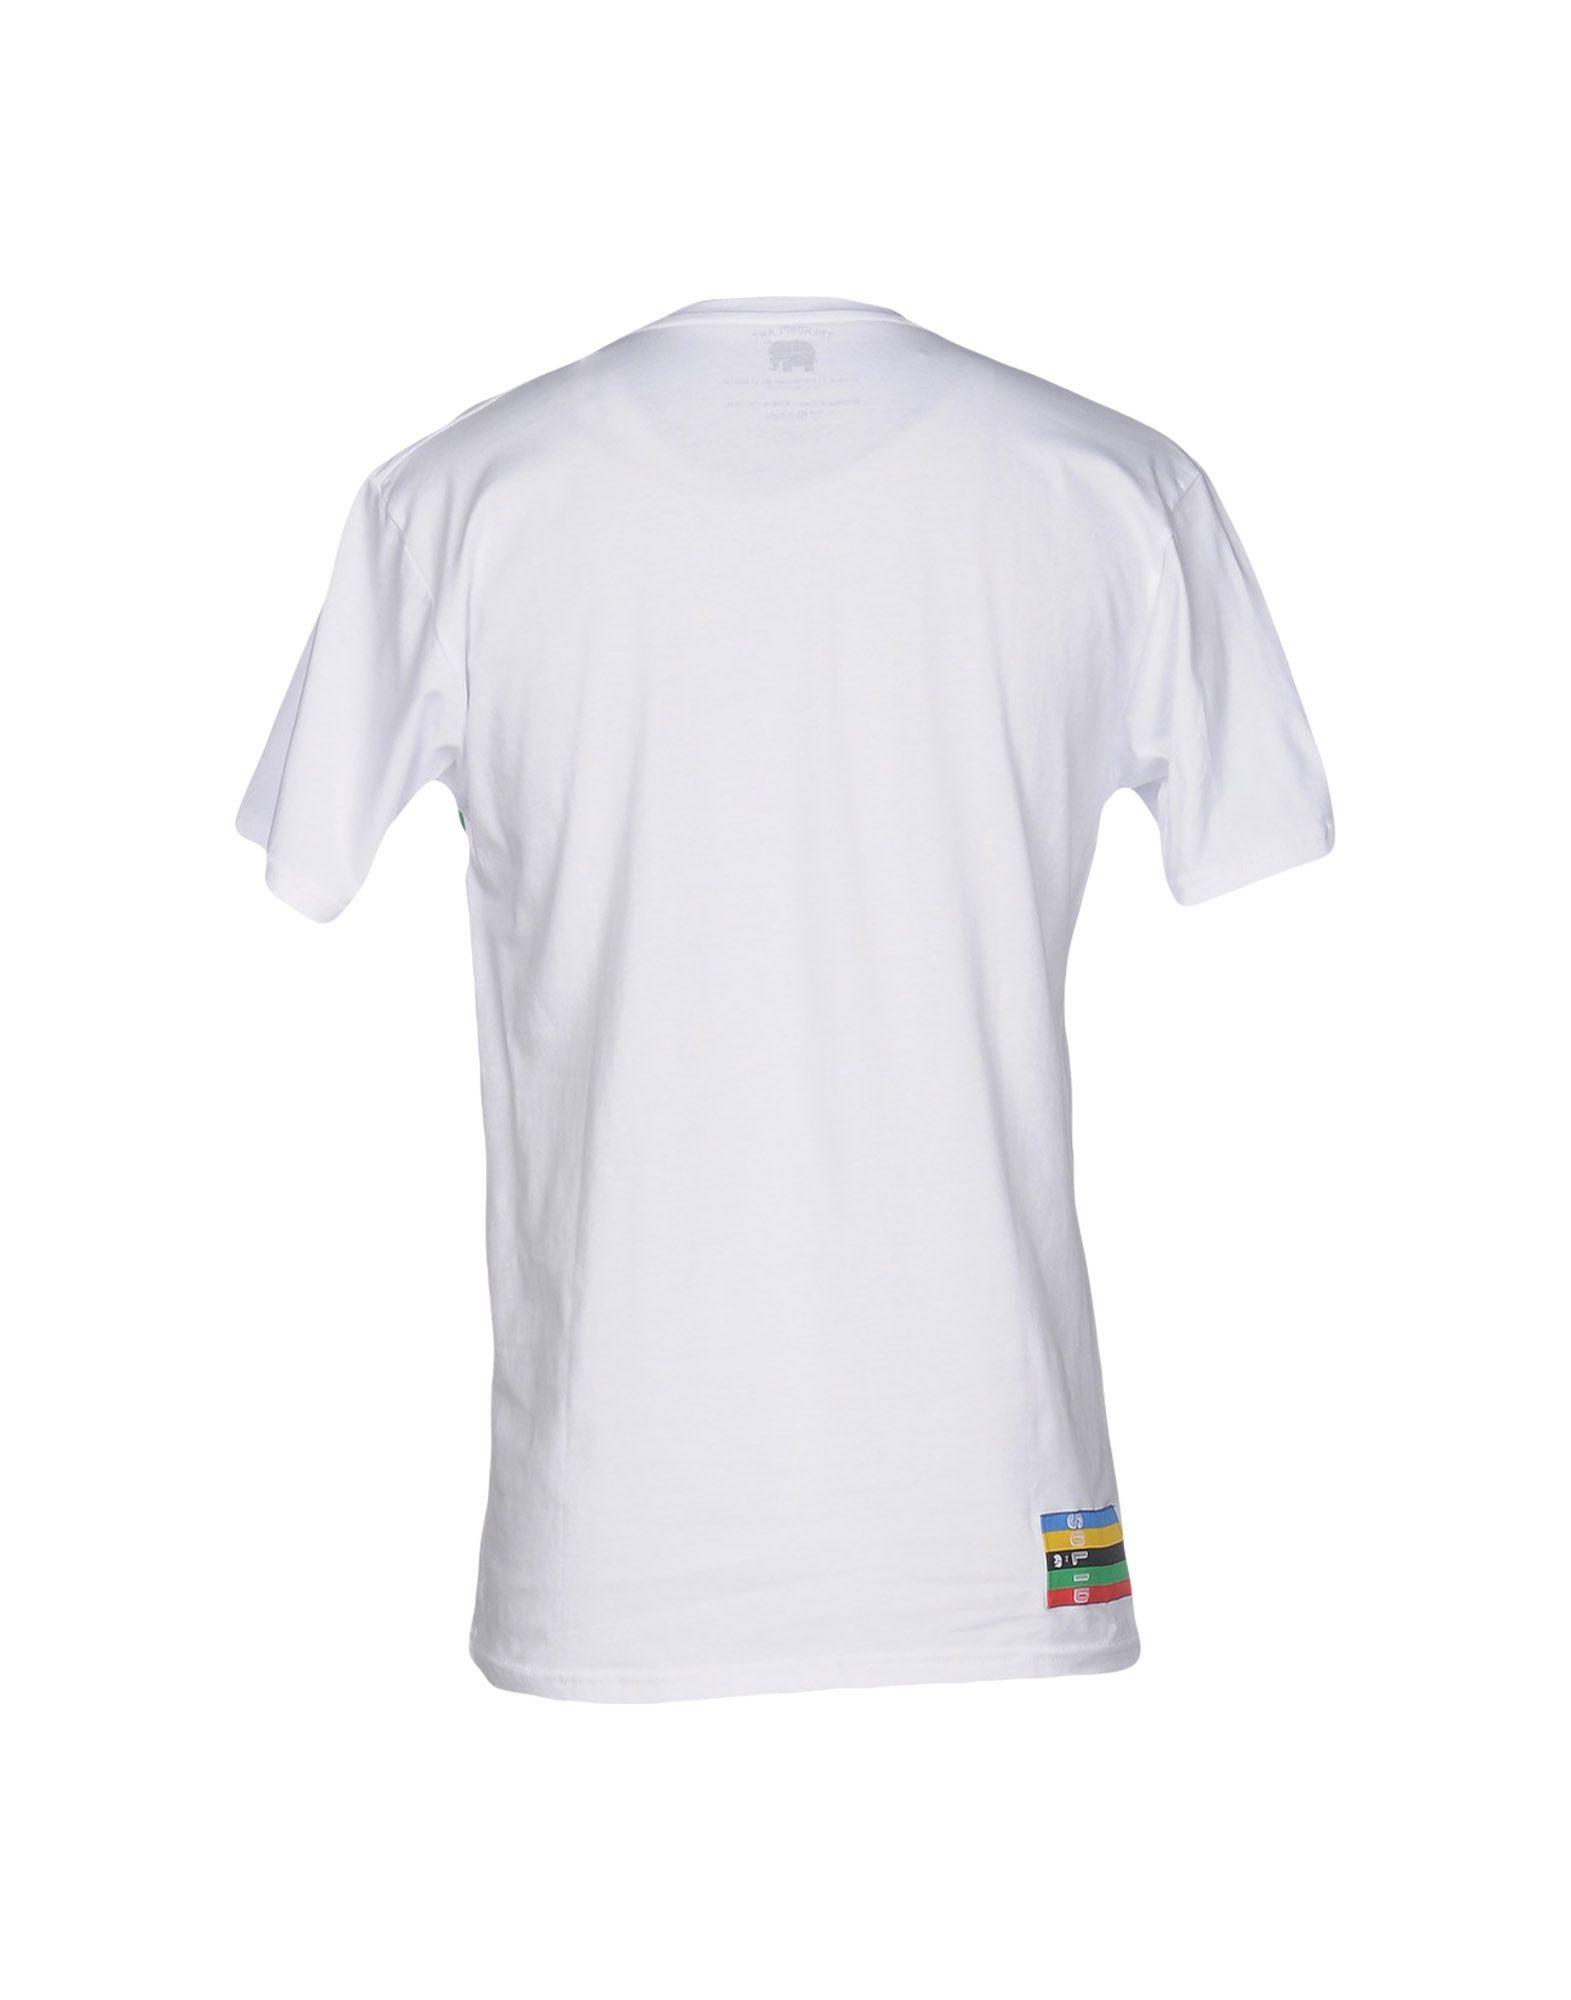 A buon mercato A buon mercato mercato buon T-Shirt Trendsplant Uomo - 12015232XP 1af9f7